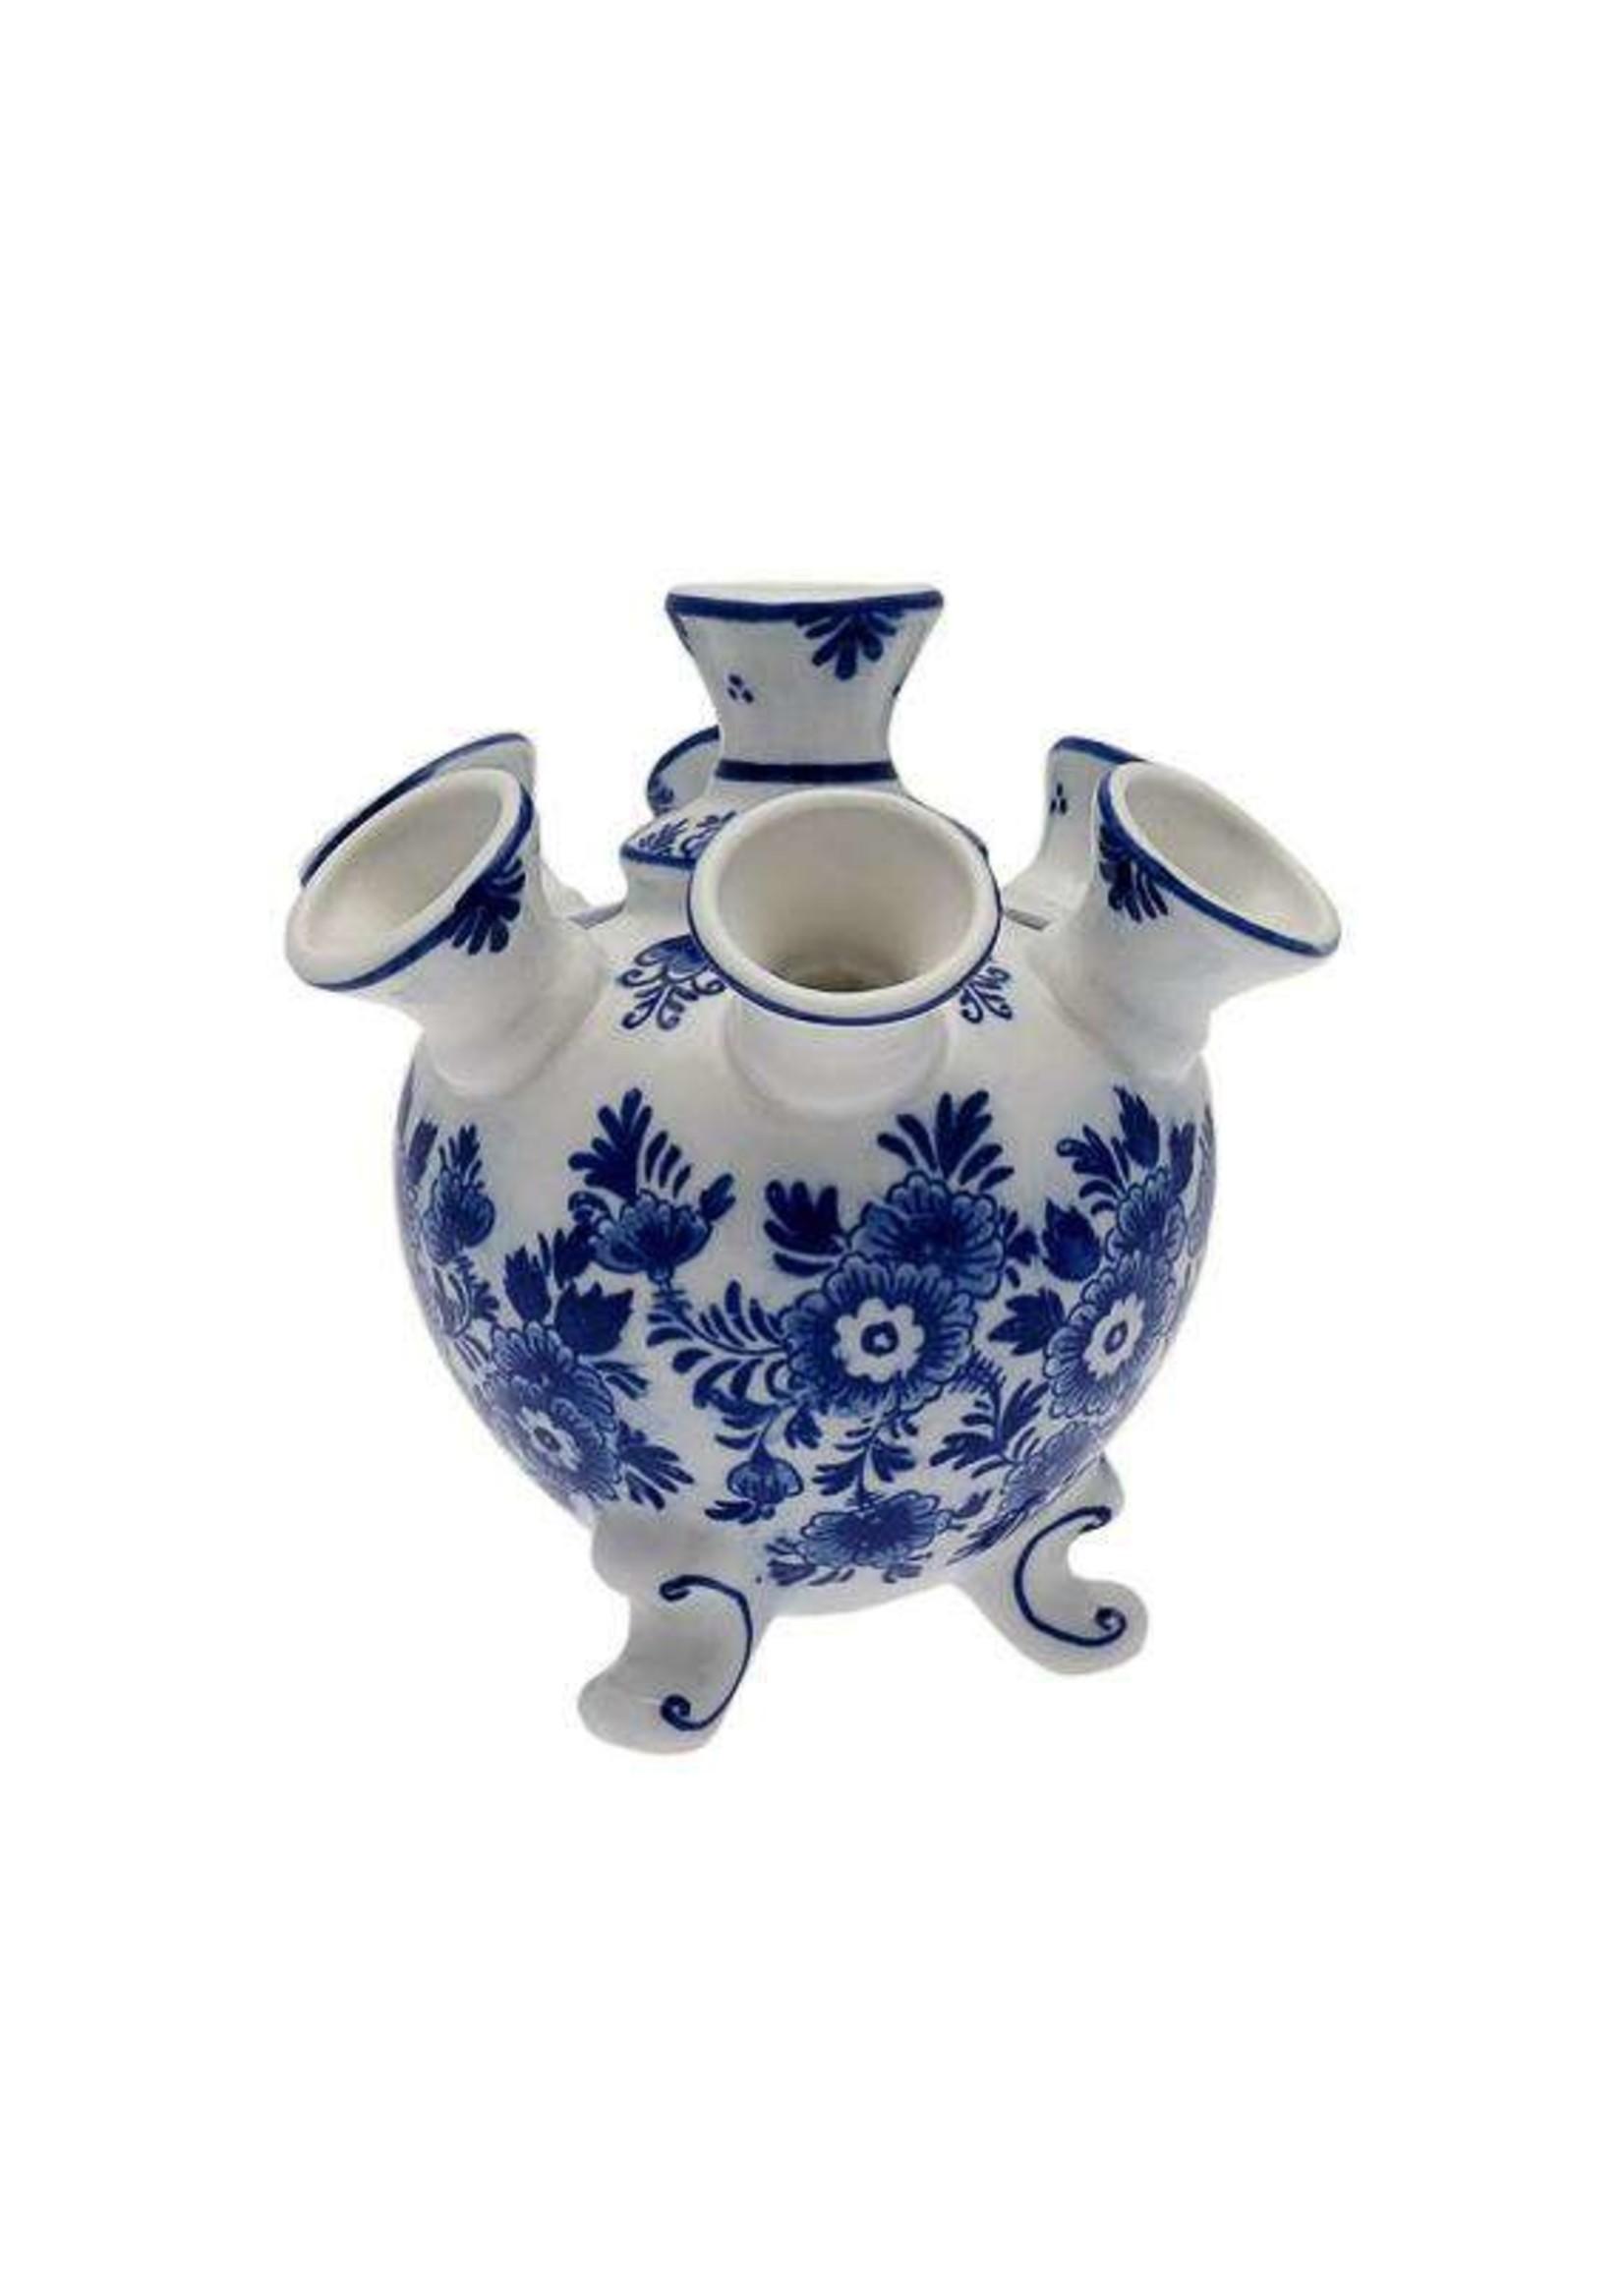 Delft Blue Tulip Vase on Legs, Flower Design, Small